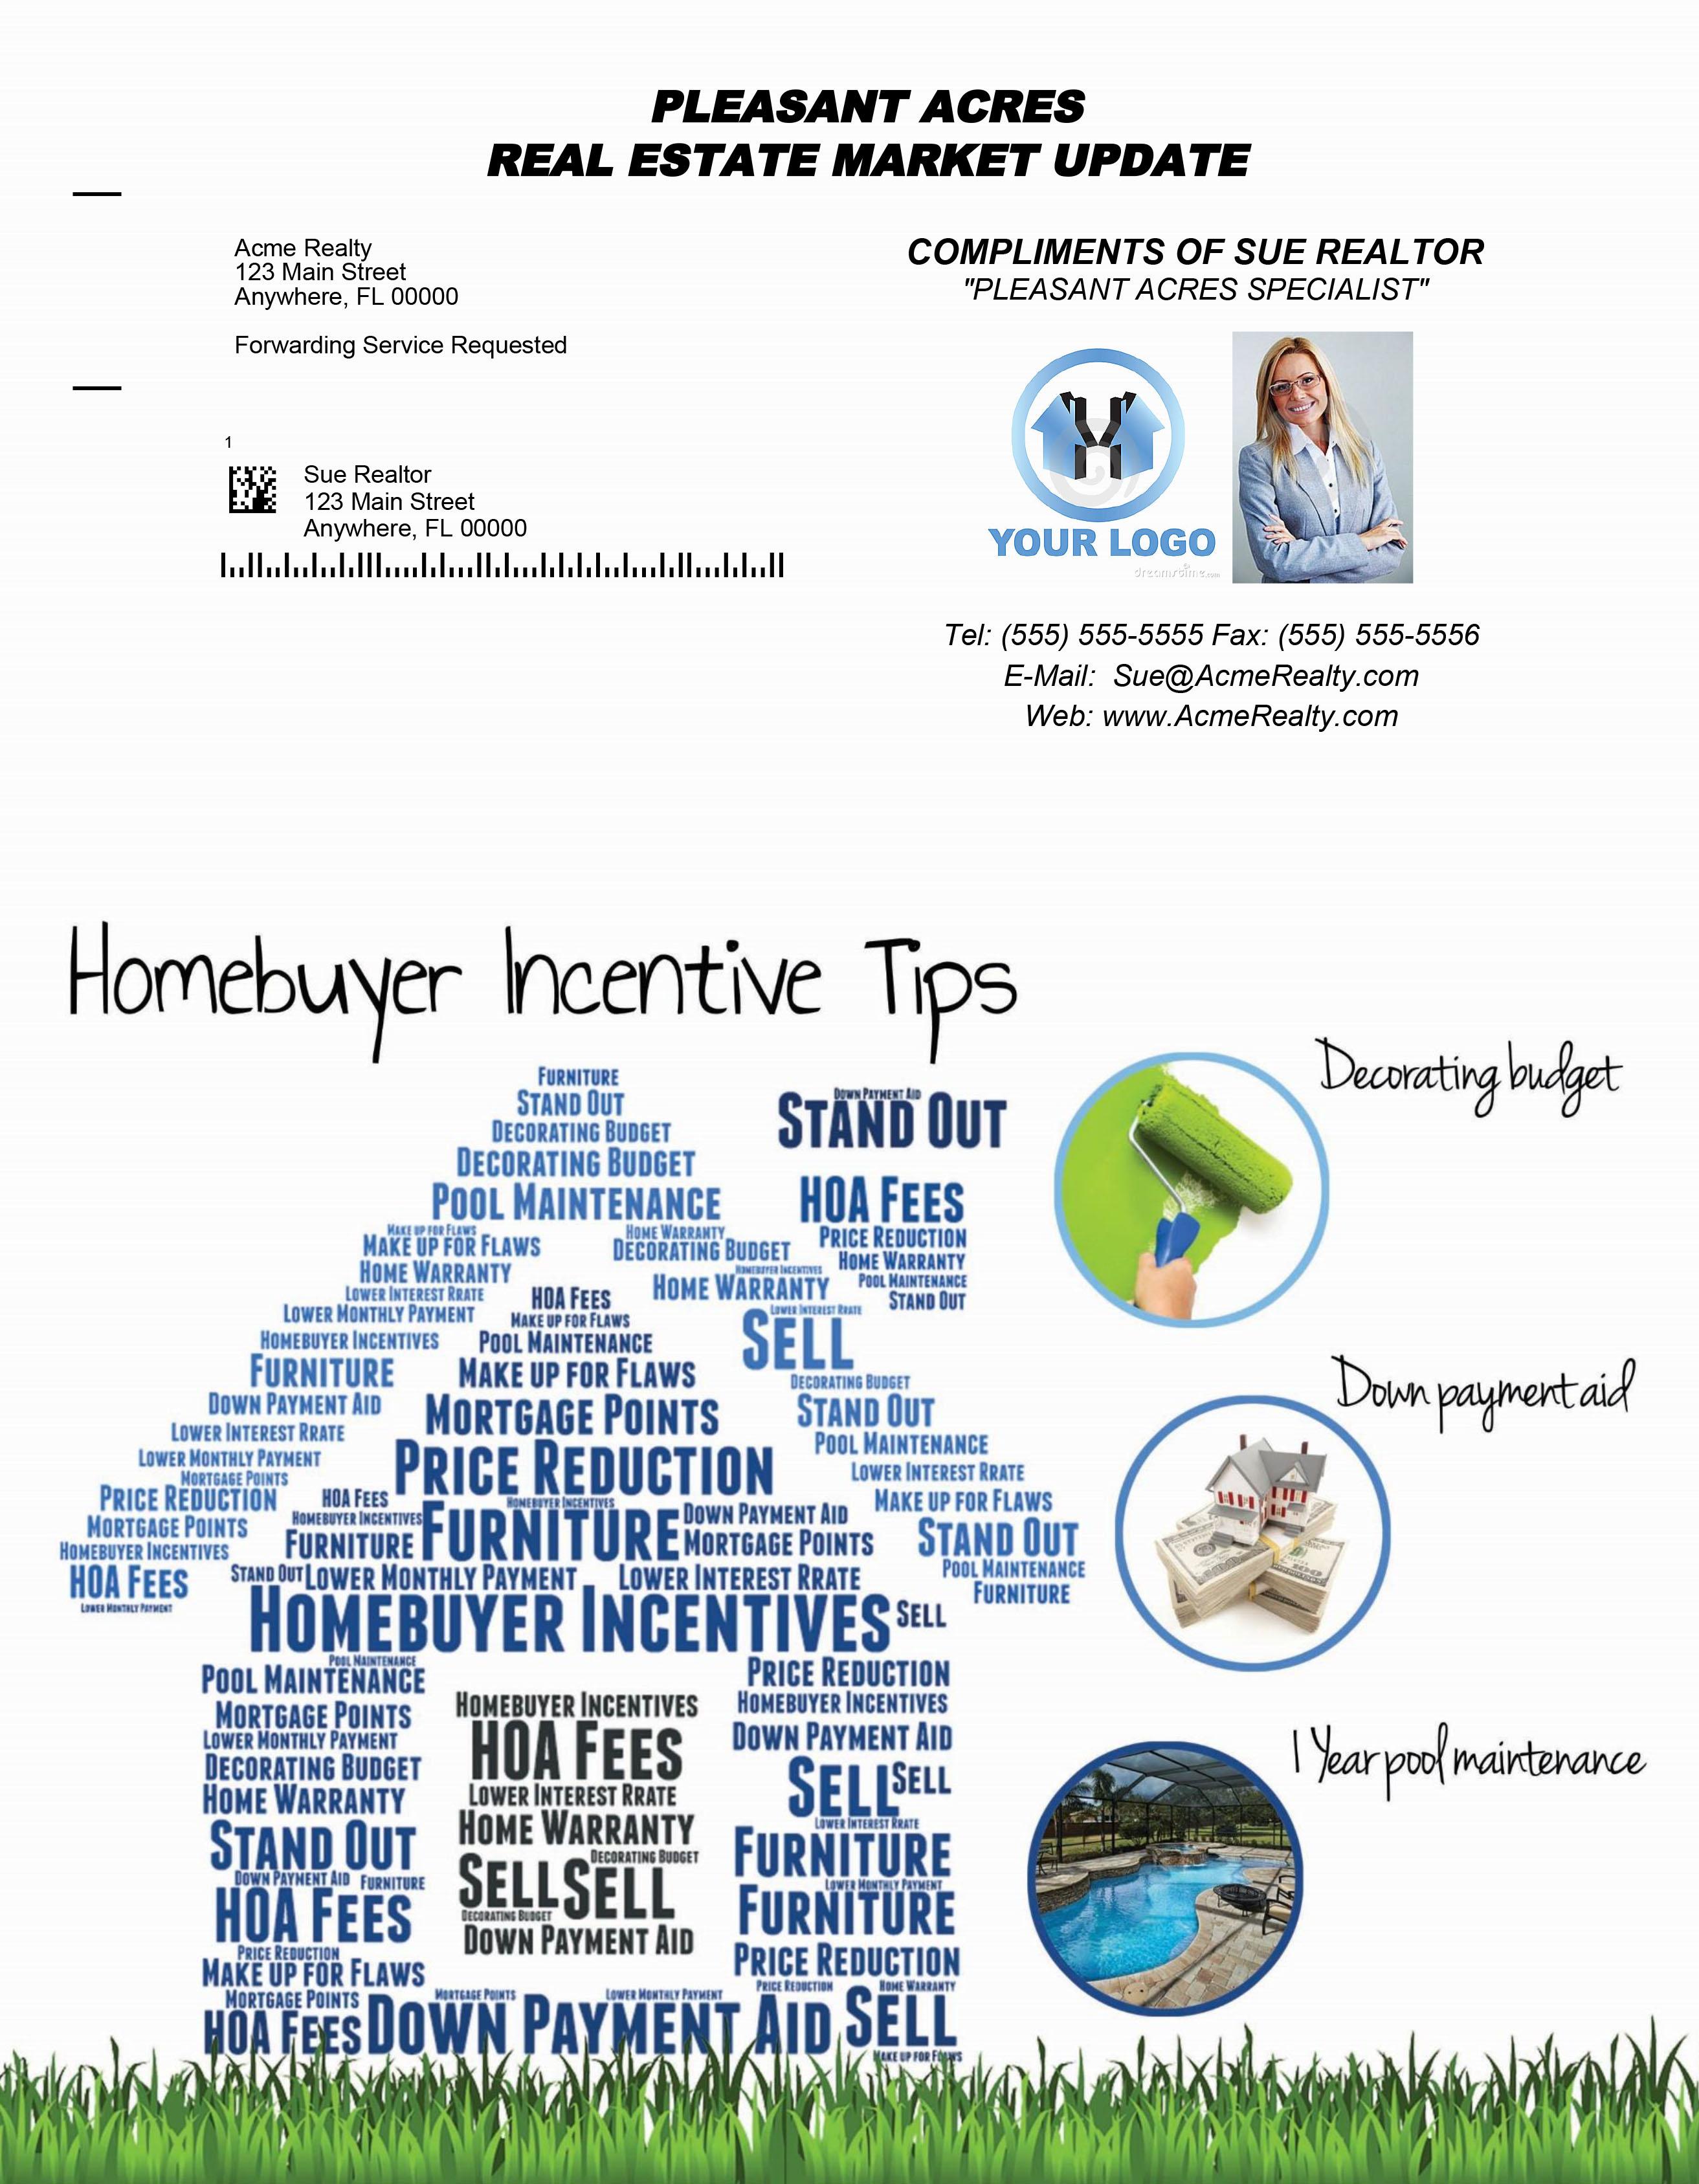 Homebuyer Incentives